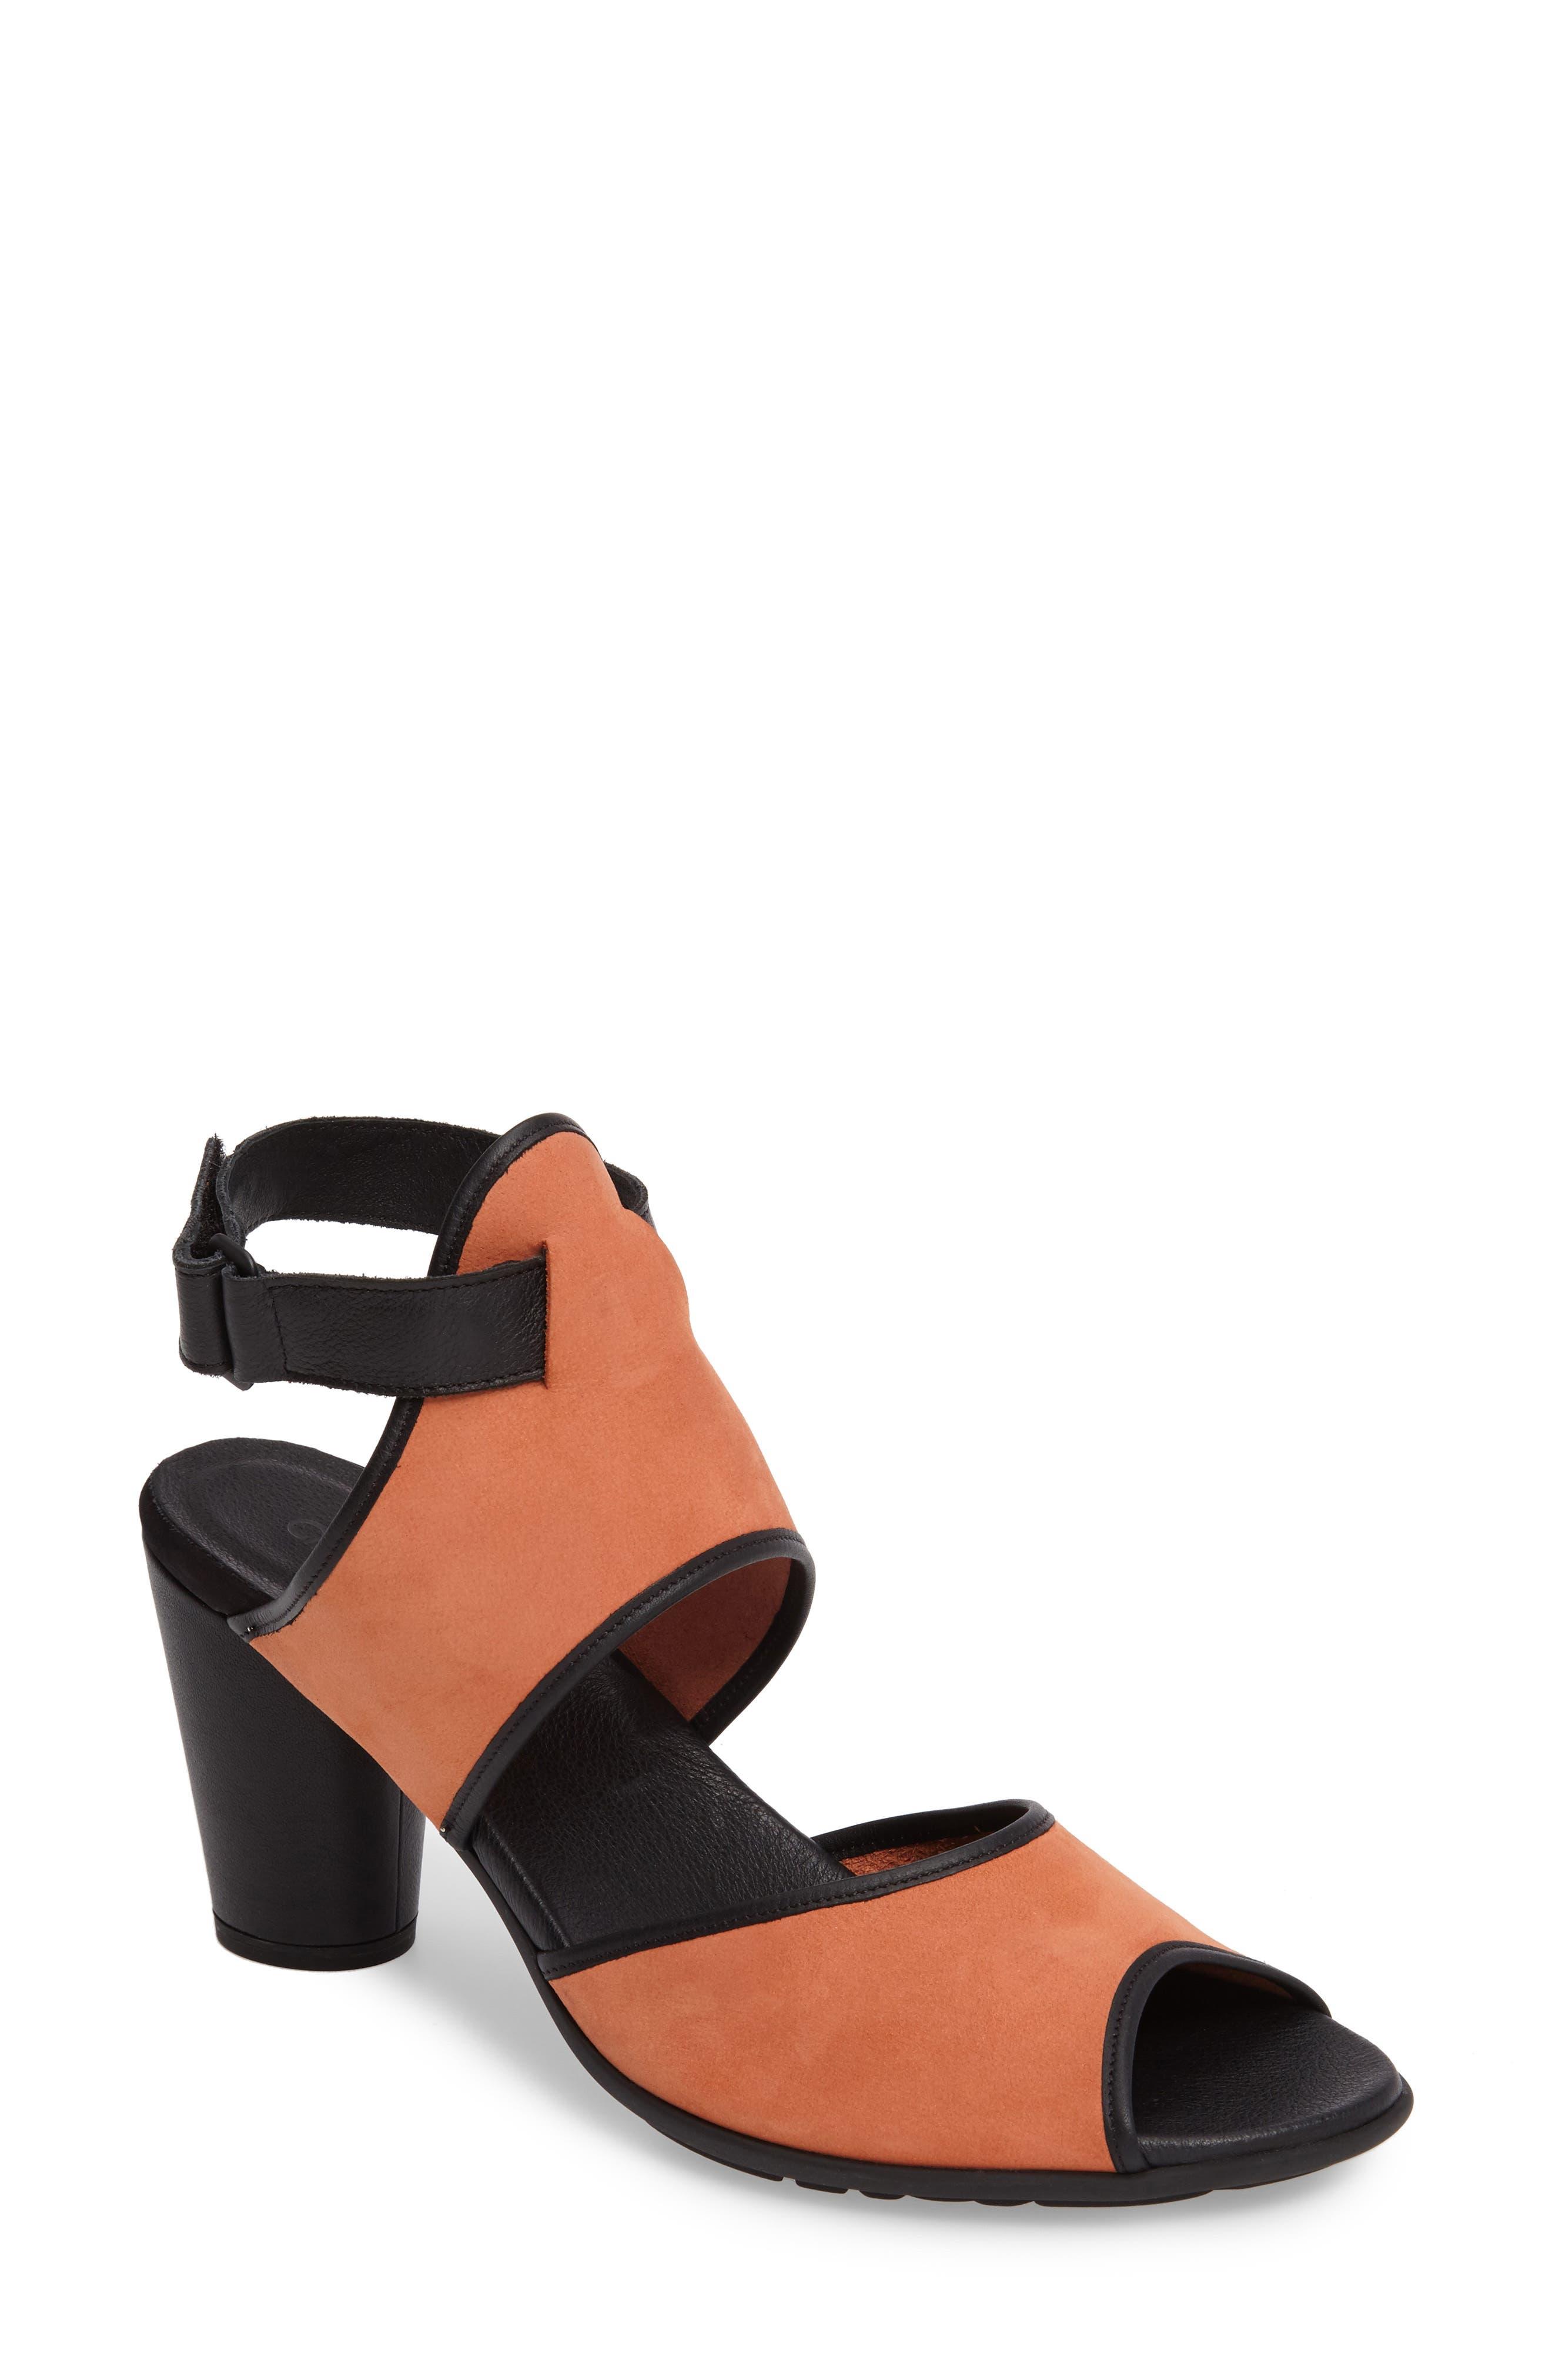 Leiga Sandal,                         Main,                         color, Morgane Nubuck Leather